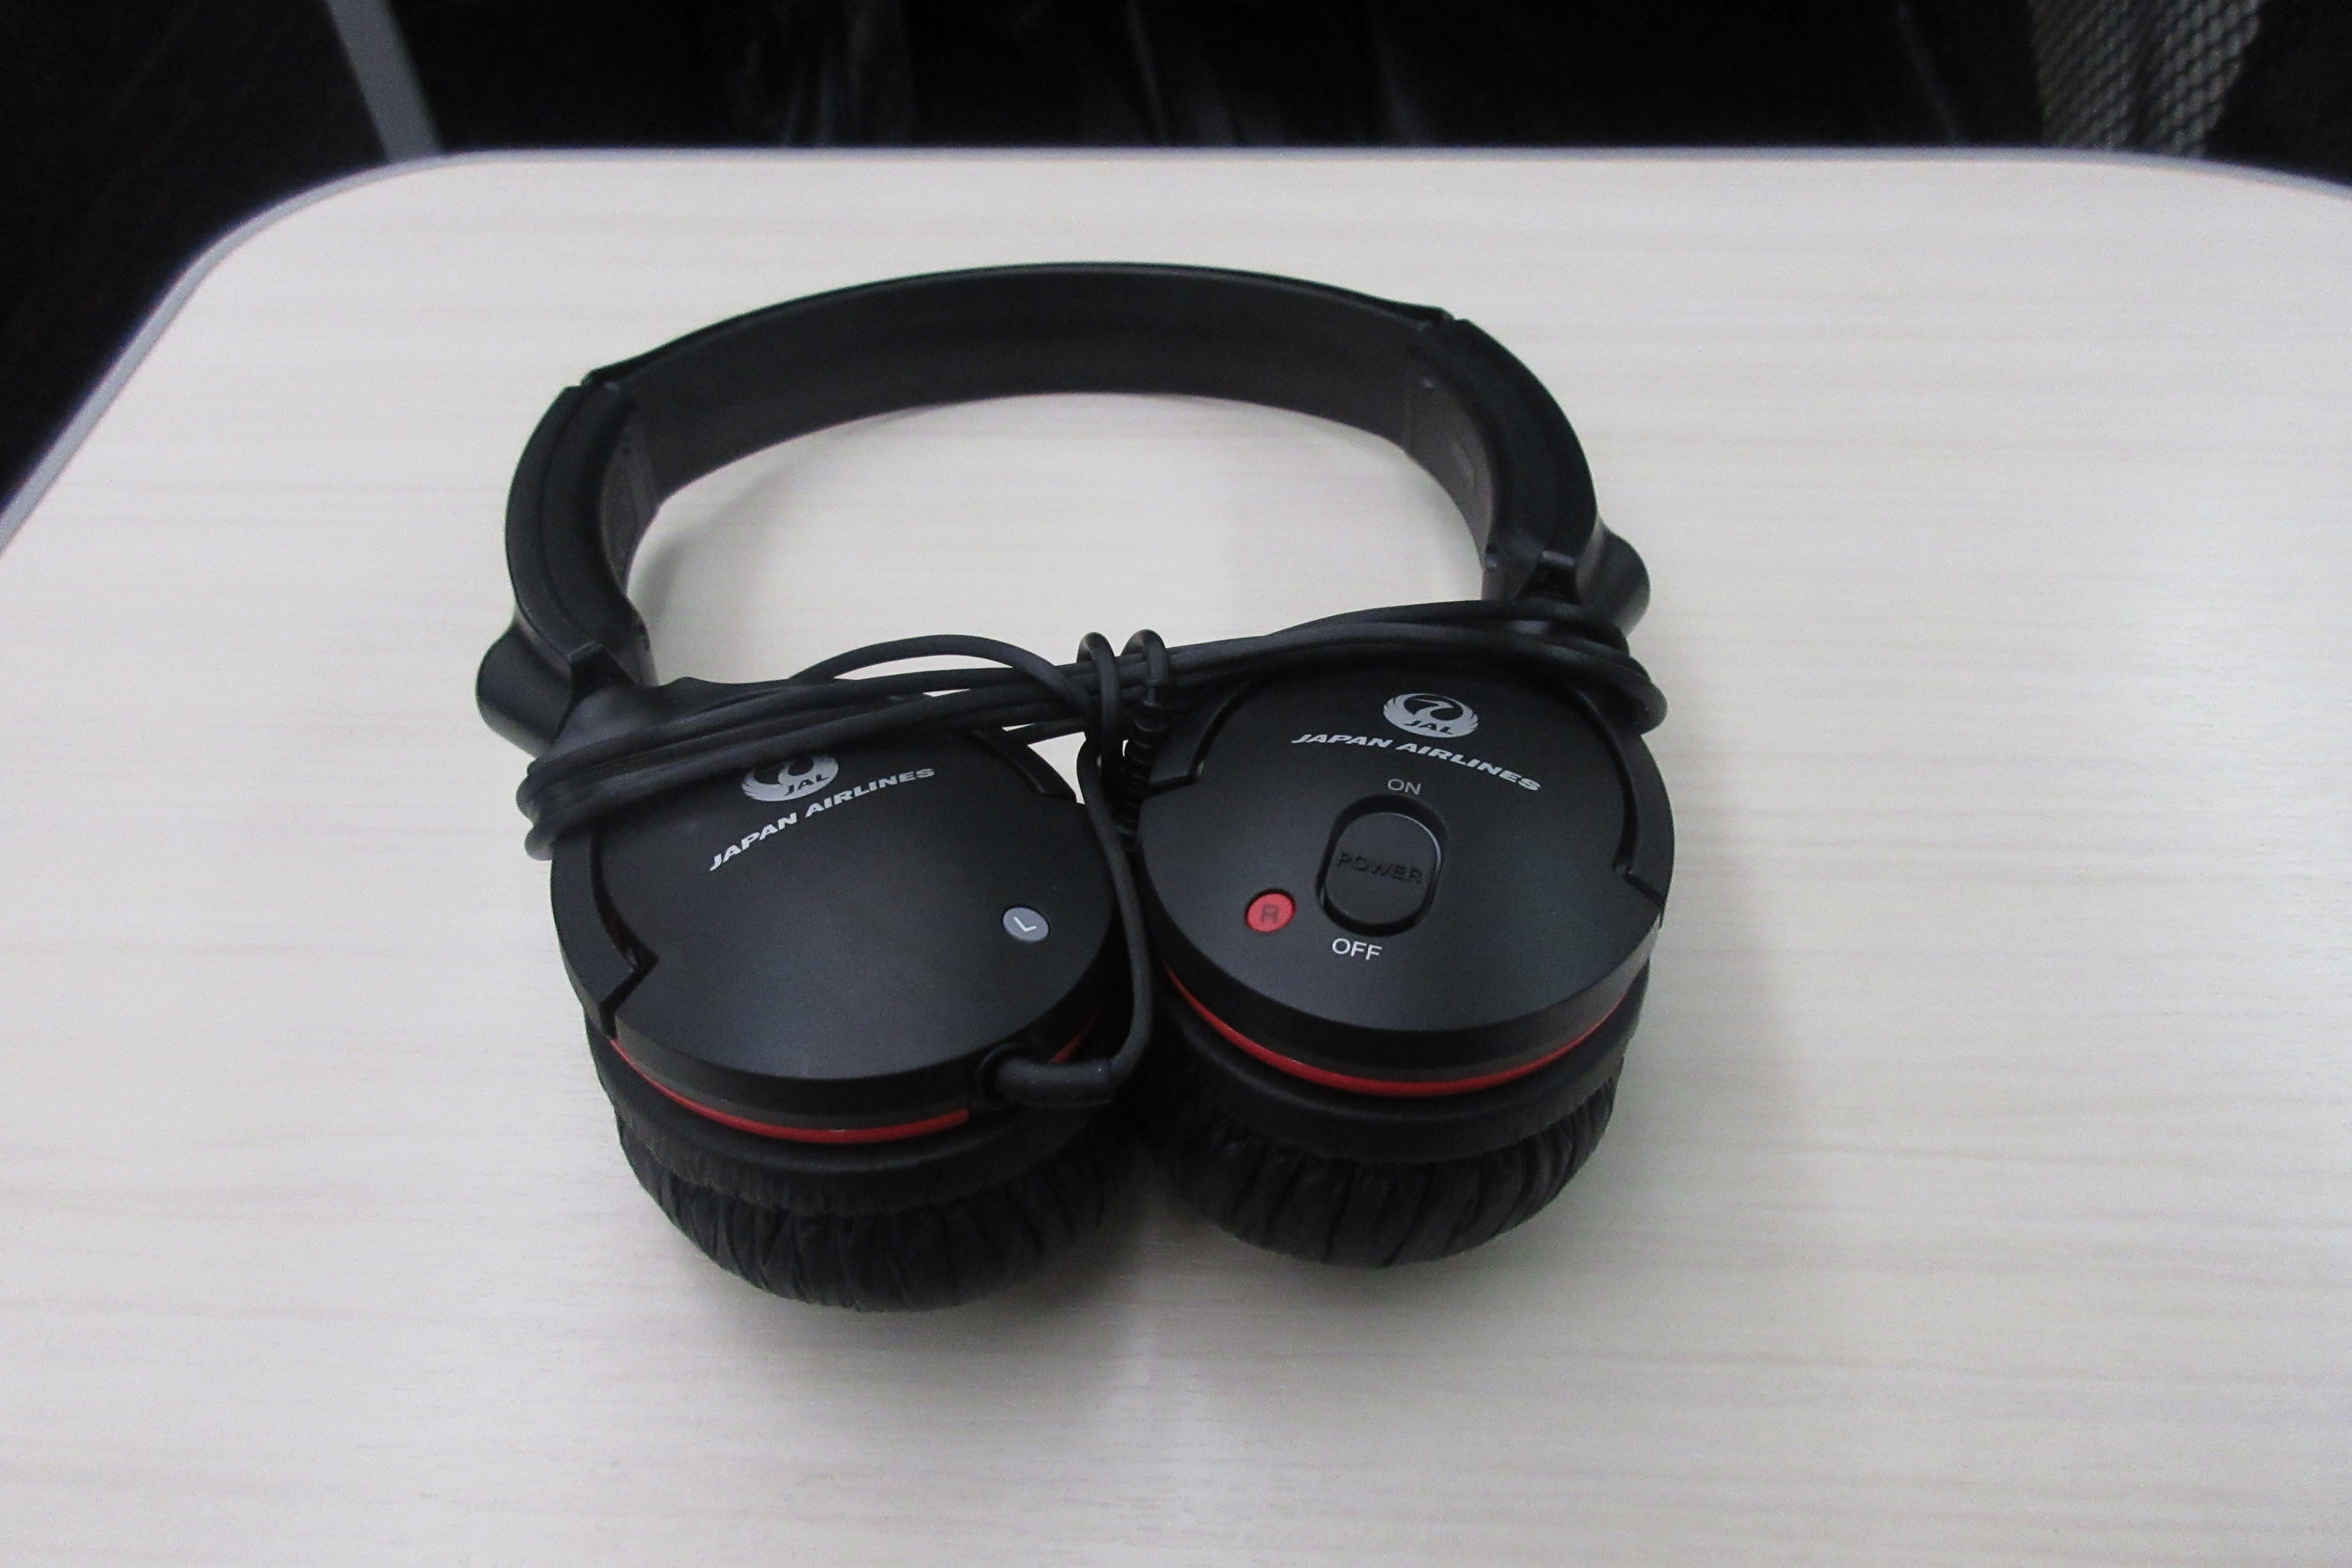 Japan Airlines business class – Headphones